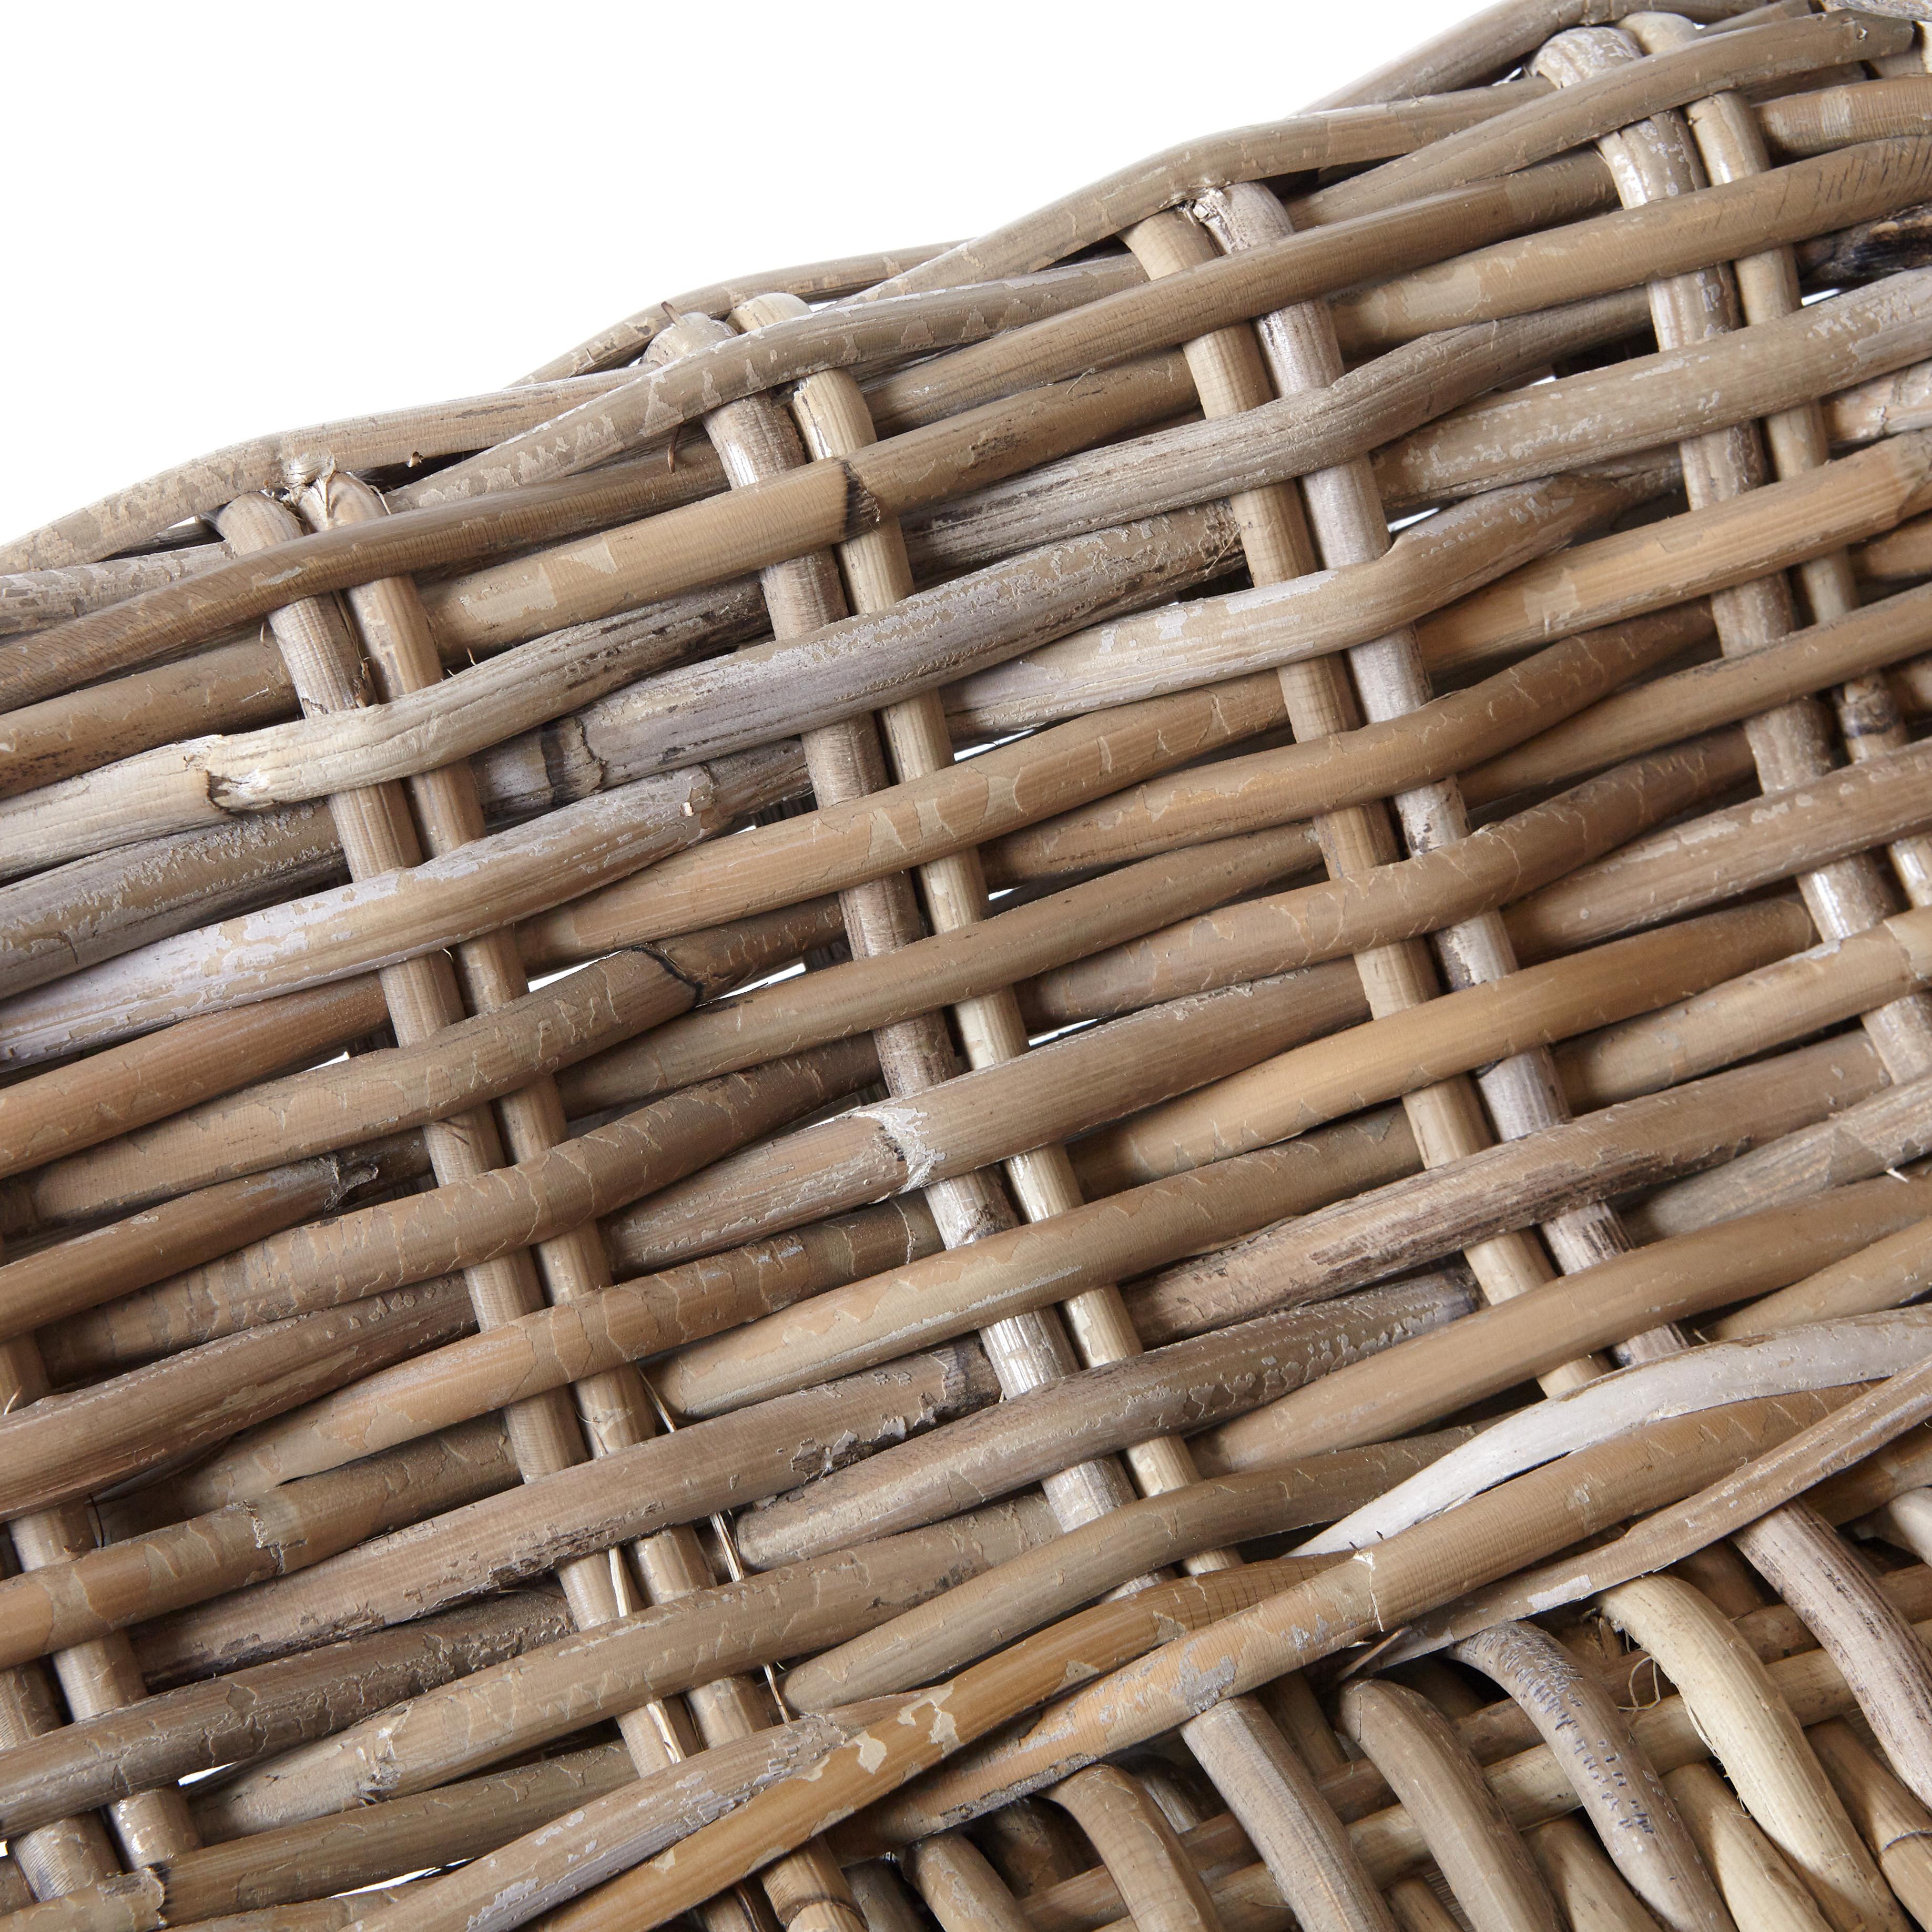 Poltrona rattan intrecciato a mano Tuamotu, Beige chiaro, large image number 1